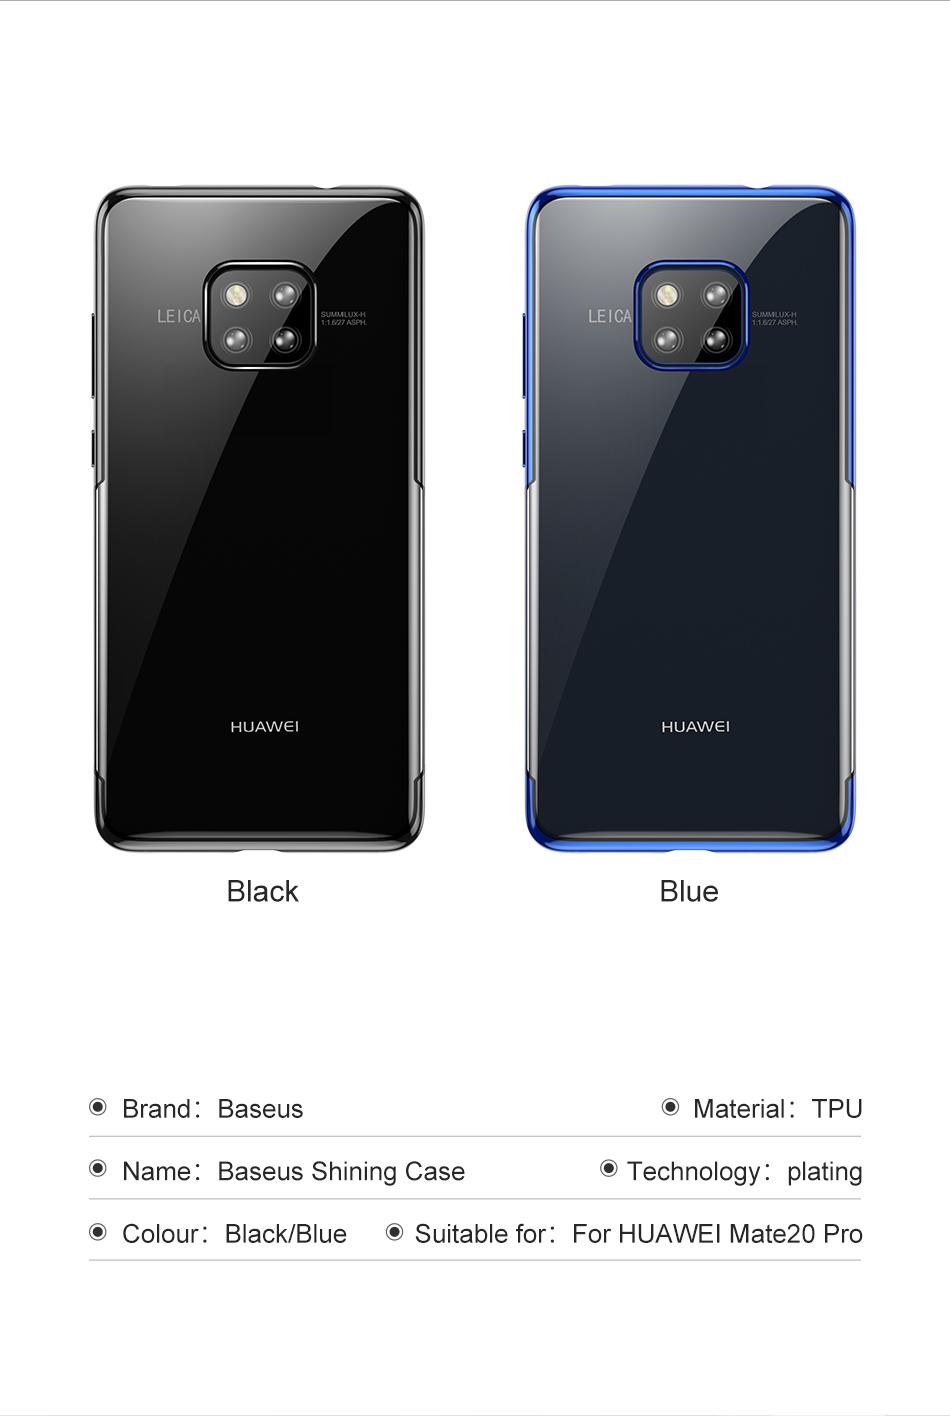 Baseus Shining Case For HUAWEI Mate20 pro Black AND BLUE_13.jpg